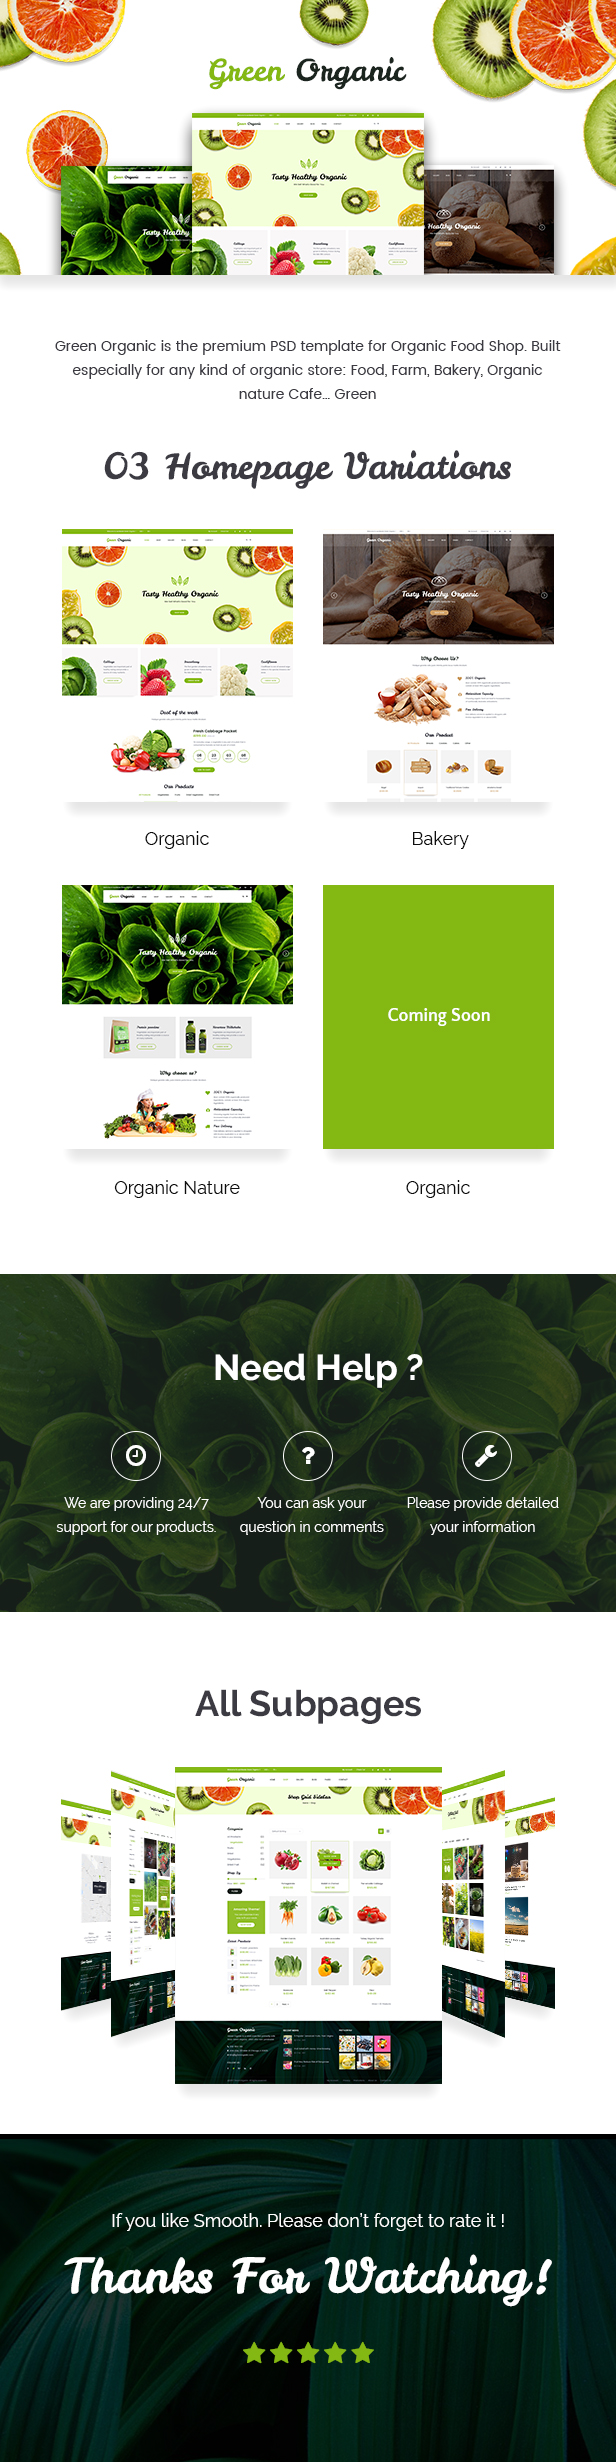 Green Organic - Organic Store & Bakery PSD Templates - 1